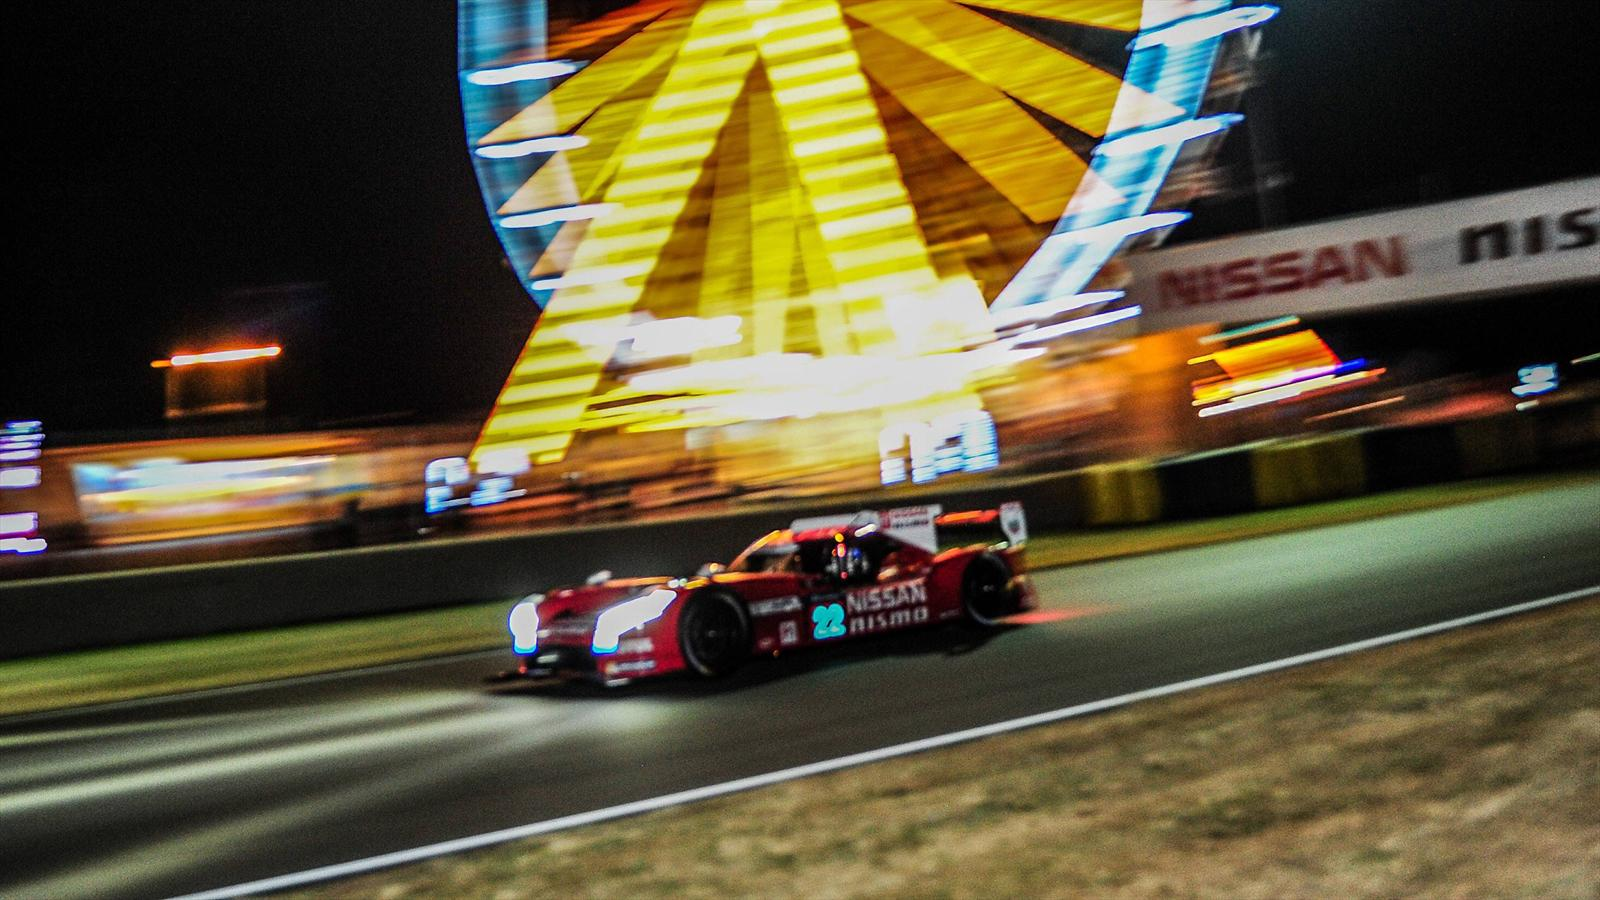 le mans 24 hours 2016 preview live tv times race details sportscar drivers track profile. Black Bedroom Furniture Sets. Home Design Ideas